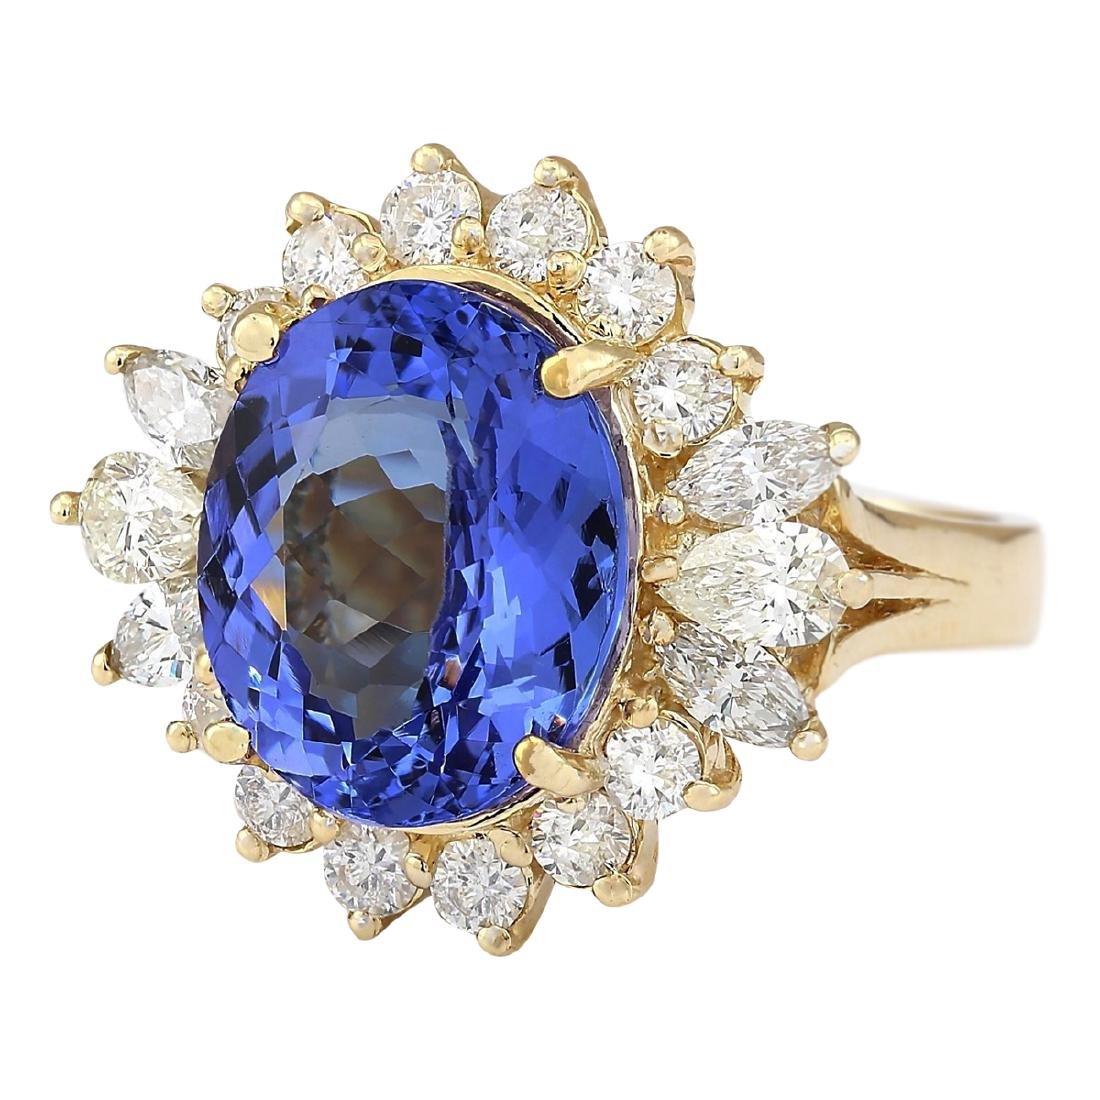 10.64 CTW Natural Tanzanite And Diamond Ring In 18K - 2